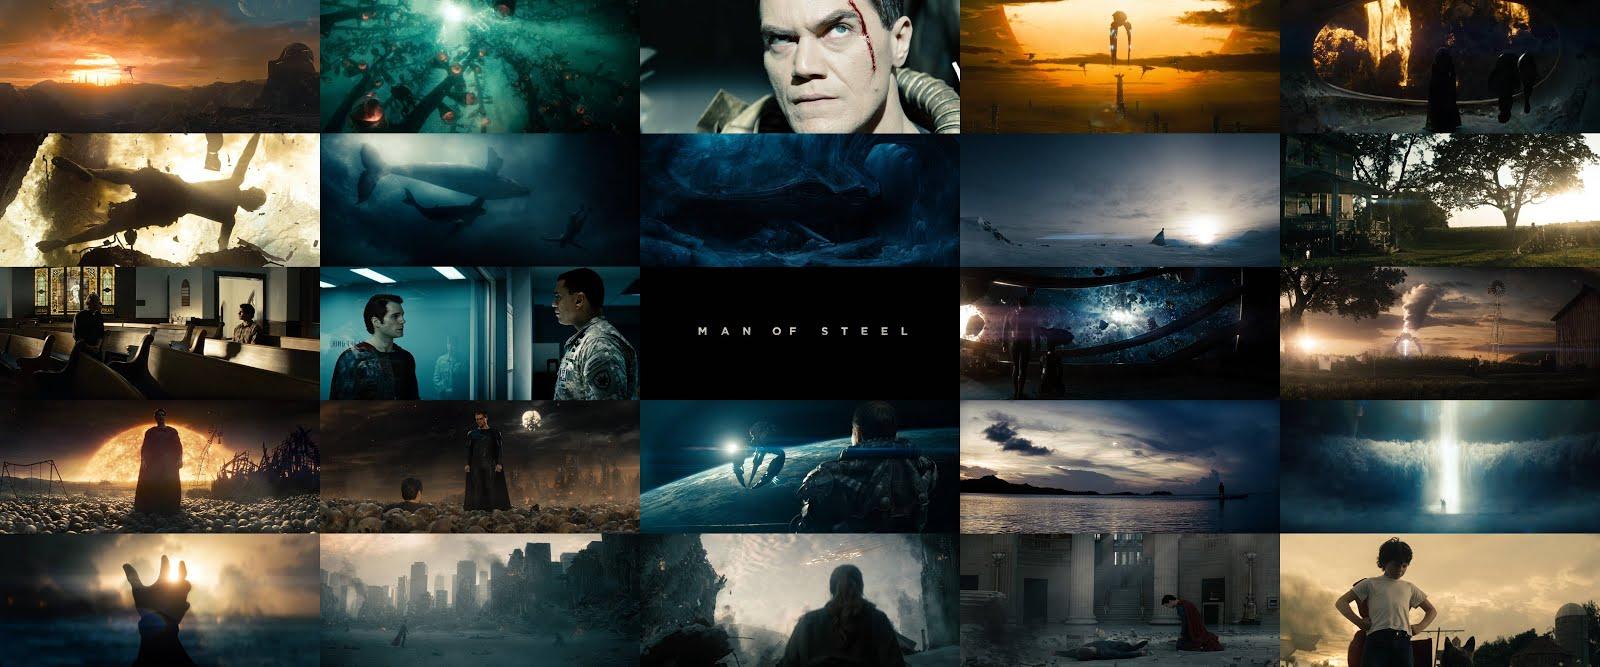 Man Of Steel (2013) Hindi DD 5.1 Dual Audio Bluray 480p 720p 1080p Esub